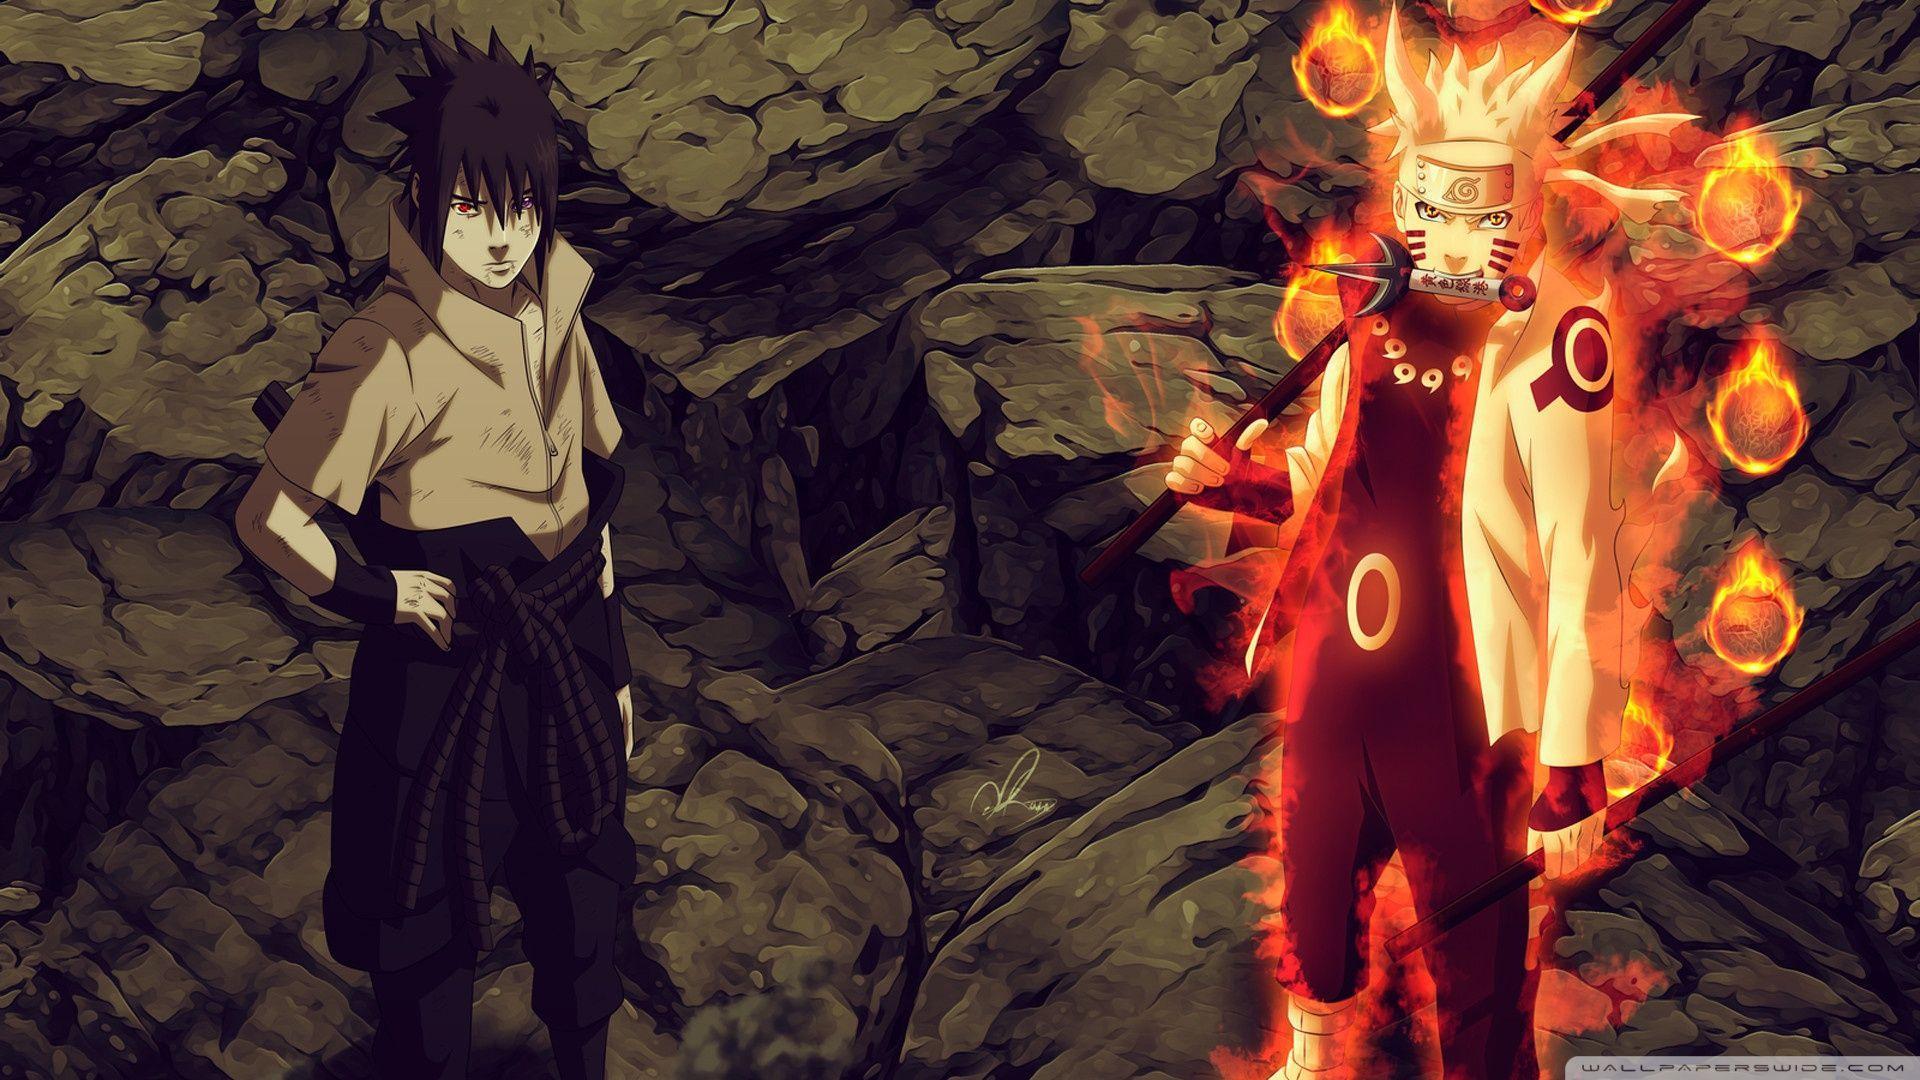 Naruto Shippuden 4k Wallpapers Top Free Naruto Shippuden 4k Backgrounds Wallpaperaccess